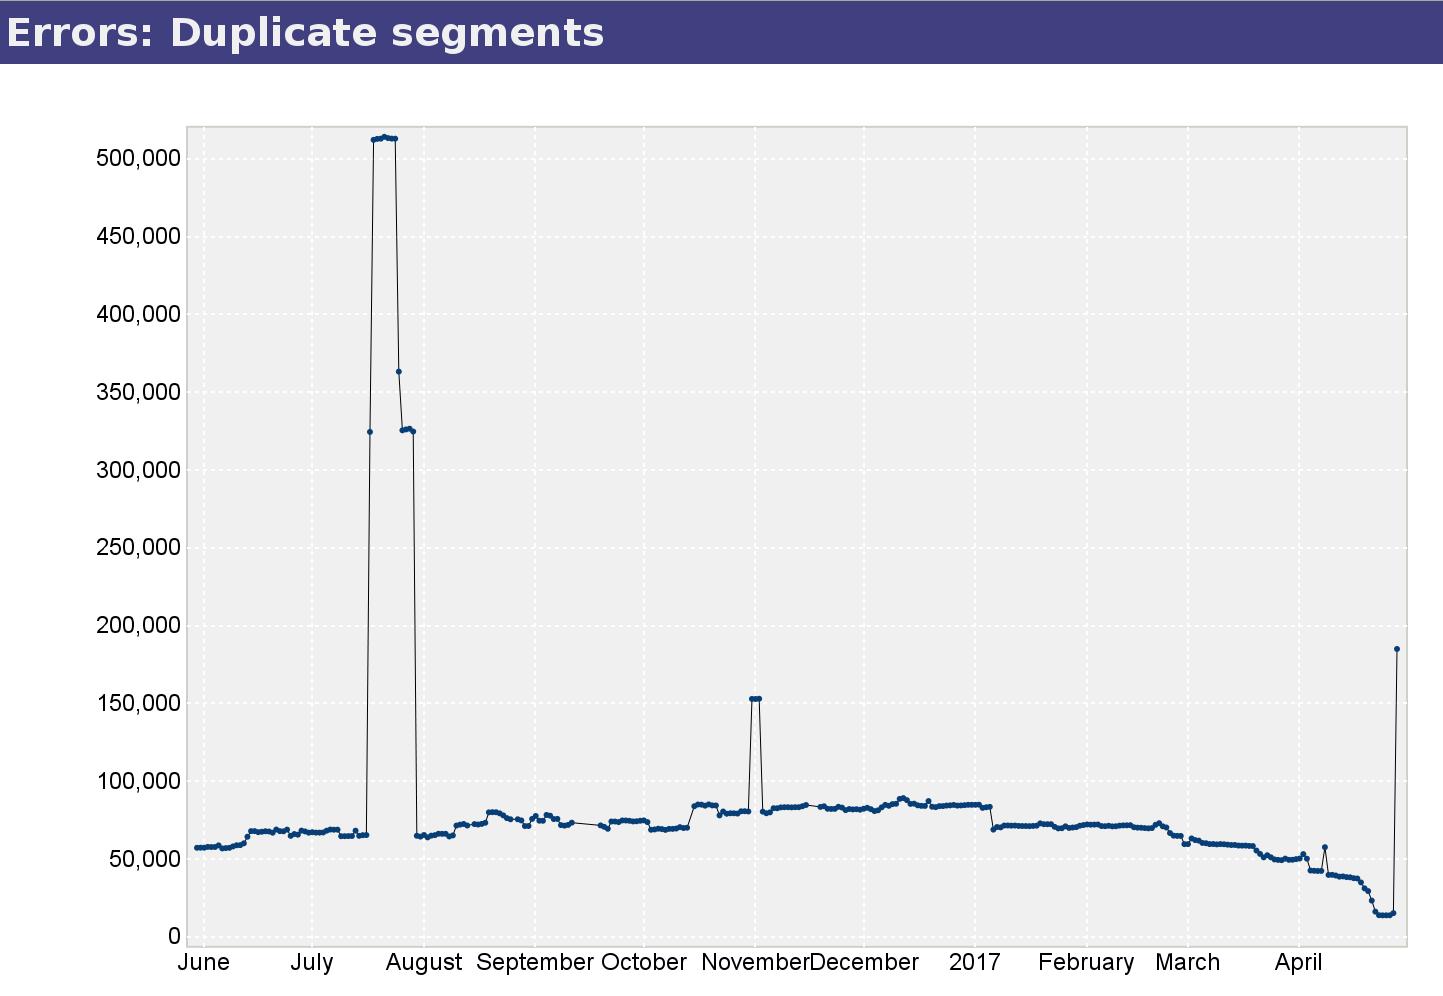 duplicate_segments_stats_2017-04-28